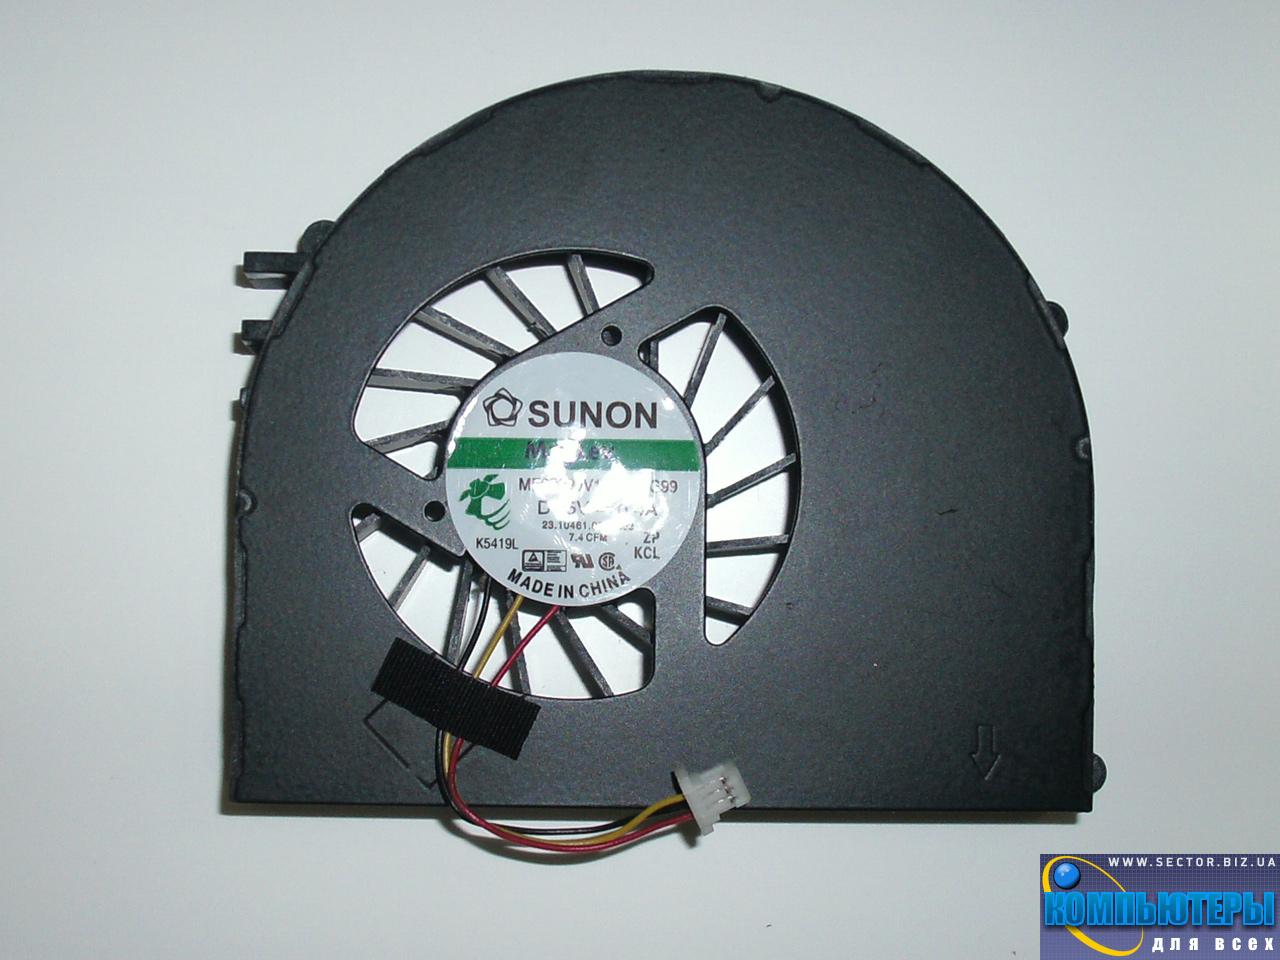 Кулер к ноутбуку Dell Inspiron 15R M5110 N5110 p/n: MF60090V1-C210-G99. Фото № 2.